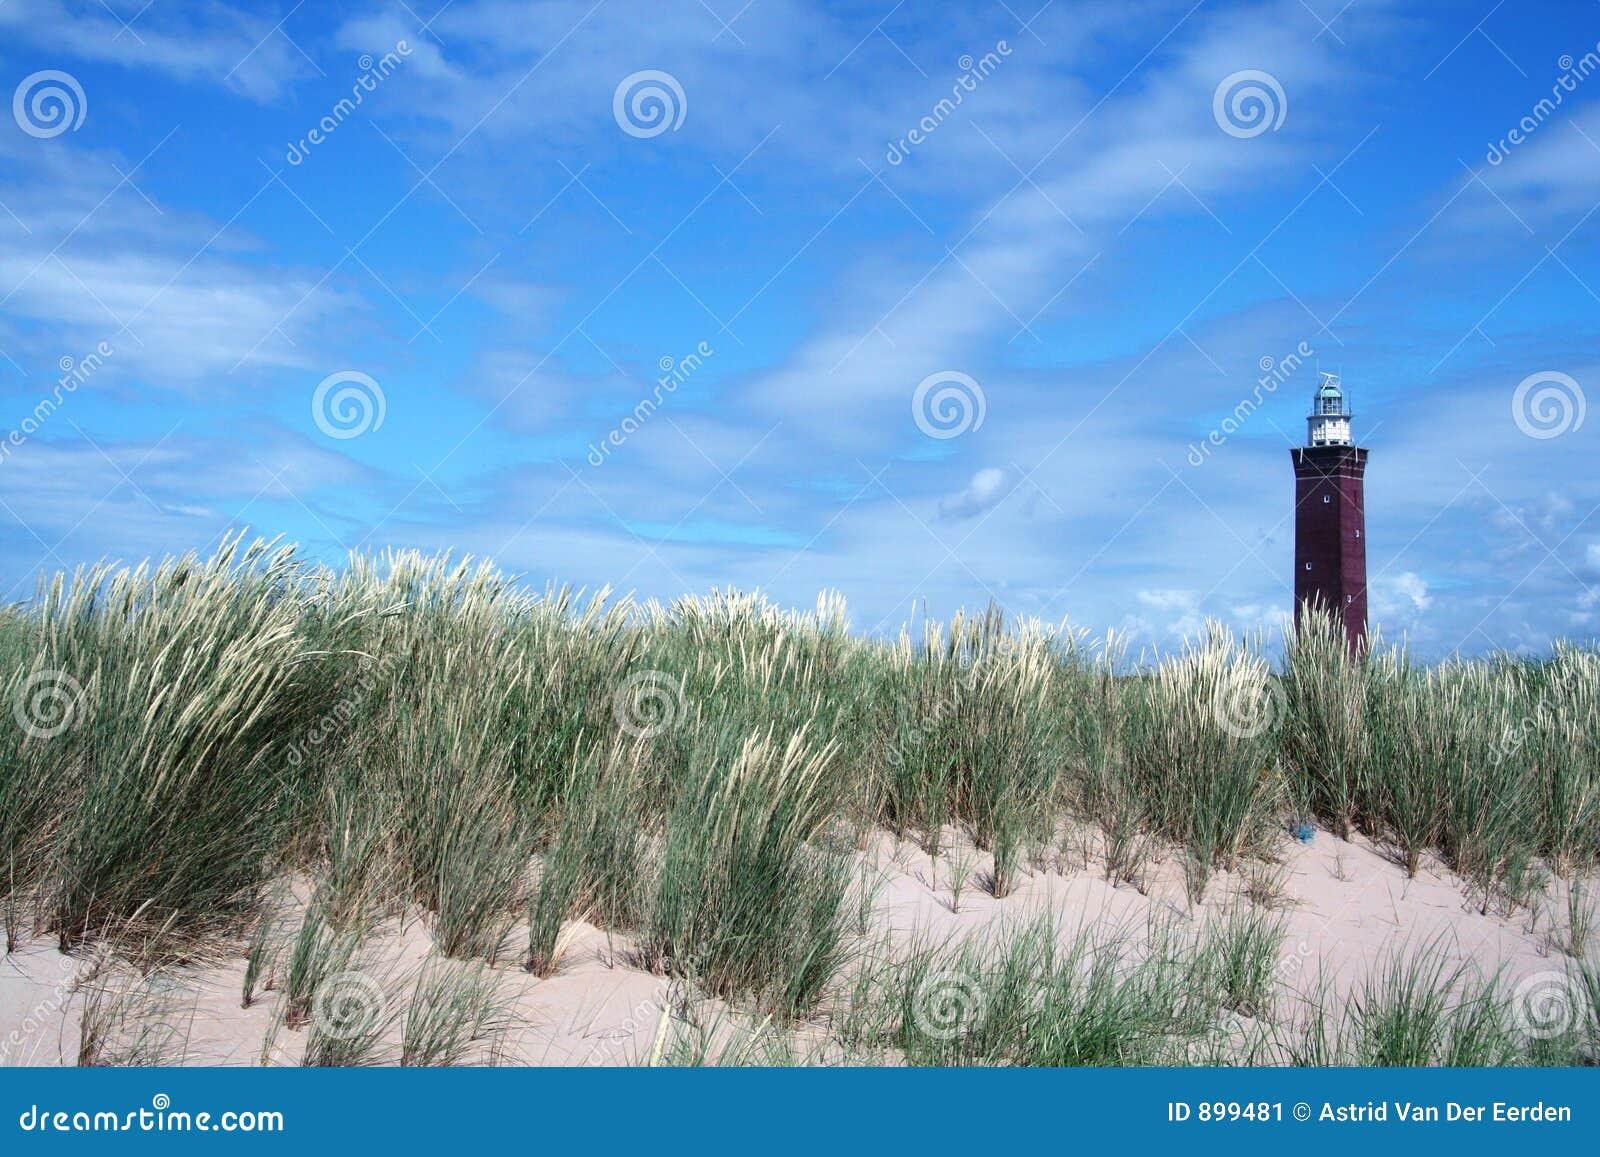 Dutch krajobrazowa latarnia morska